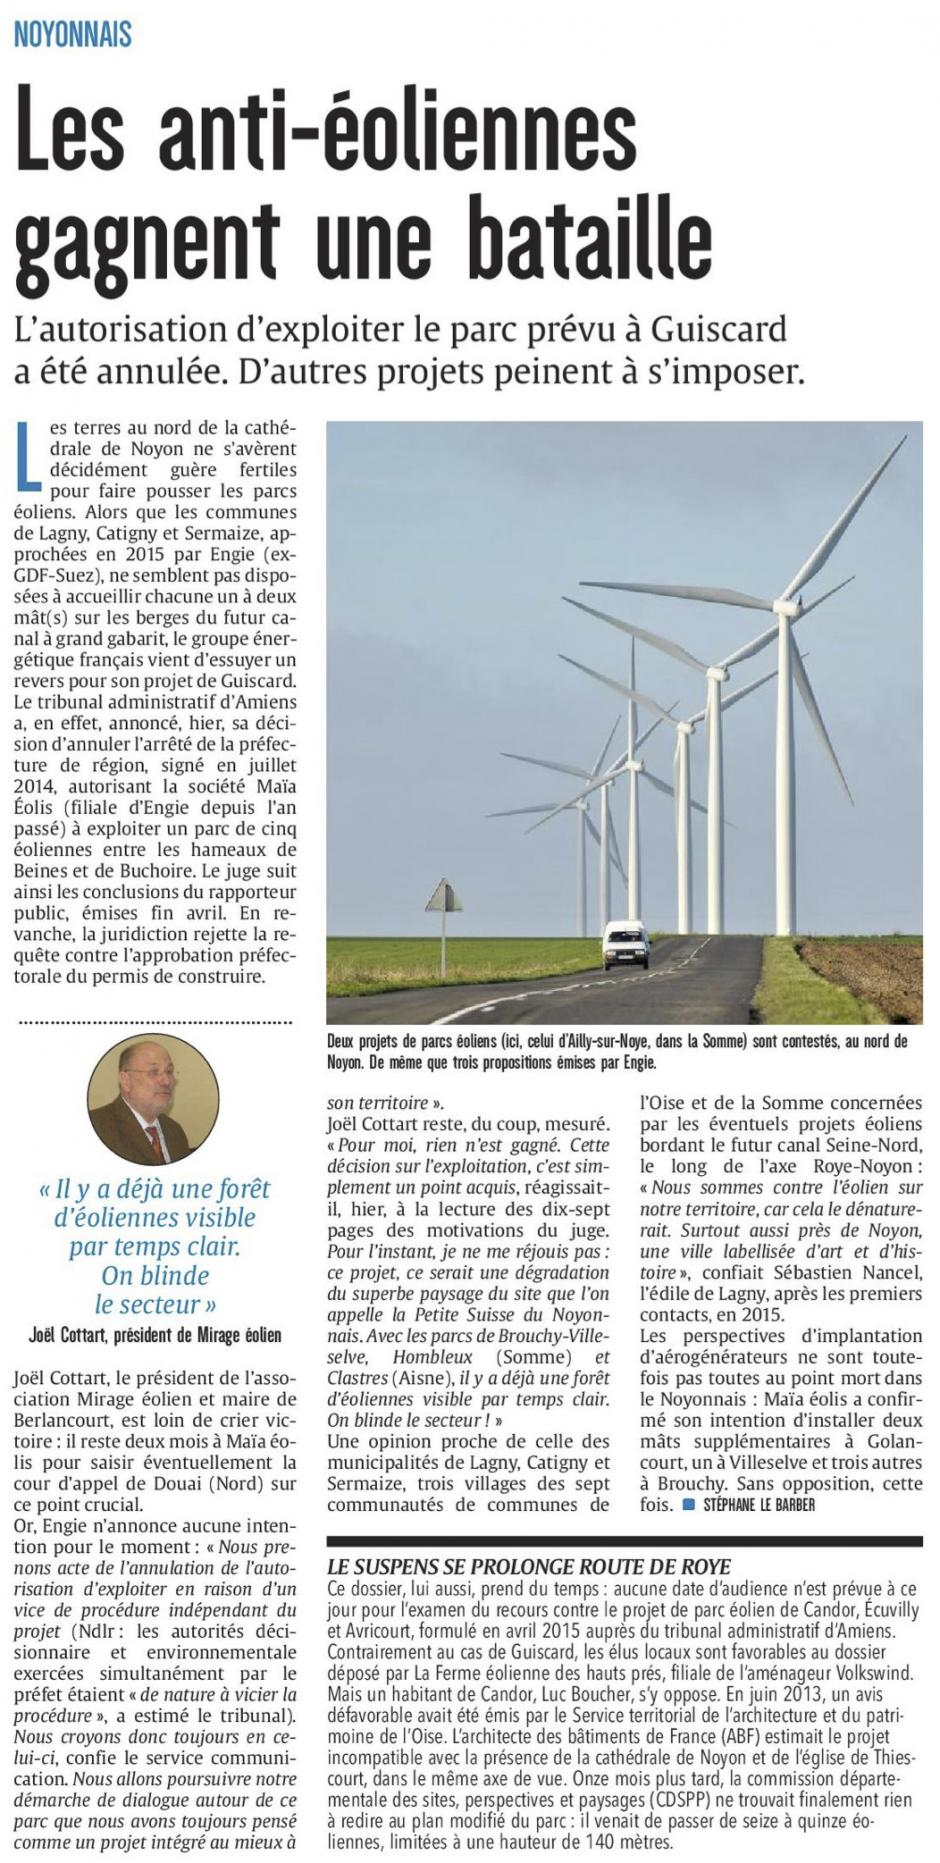 20170523-CP-Guiscard-Les anti-éoliennes gagnent une bataille